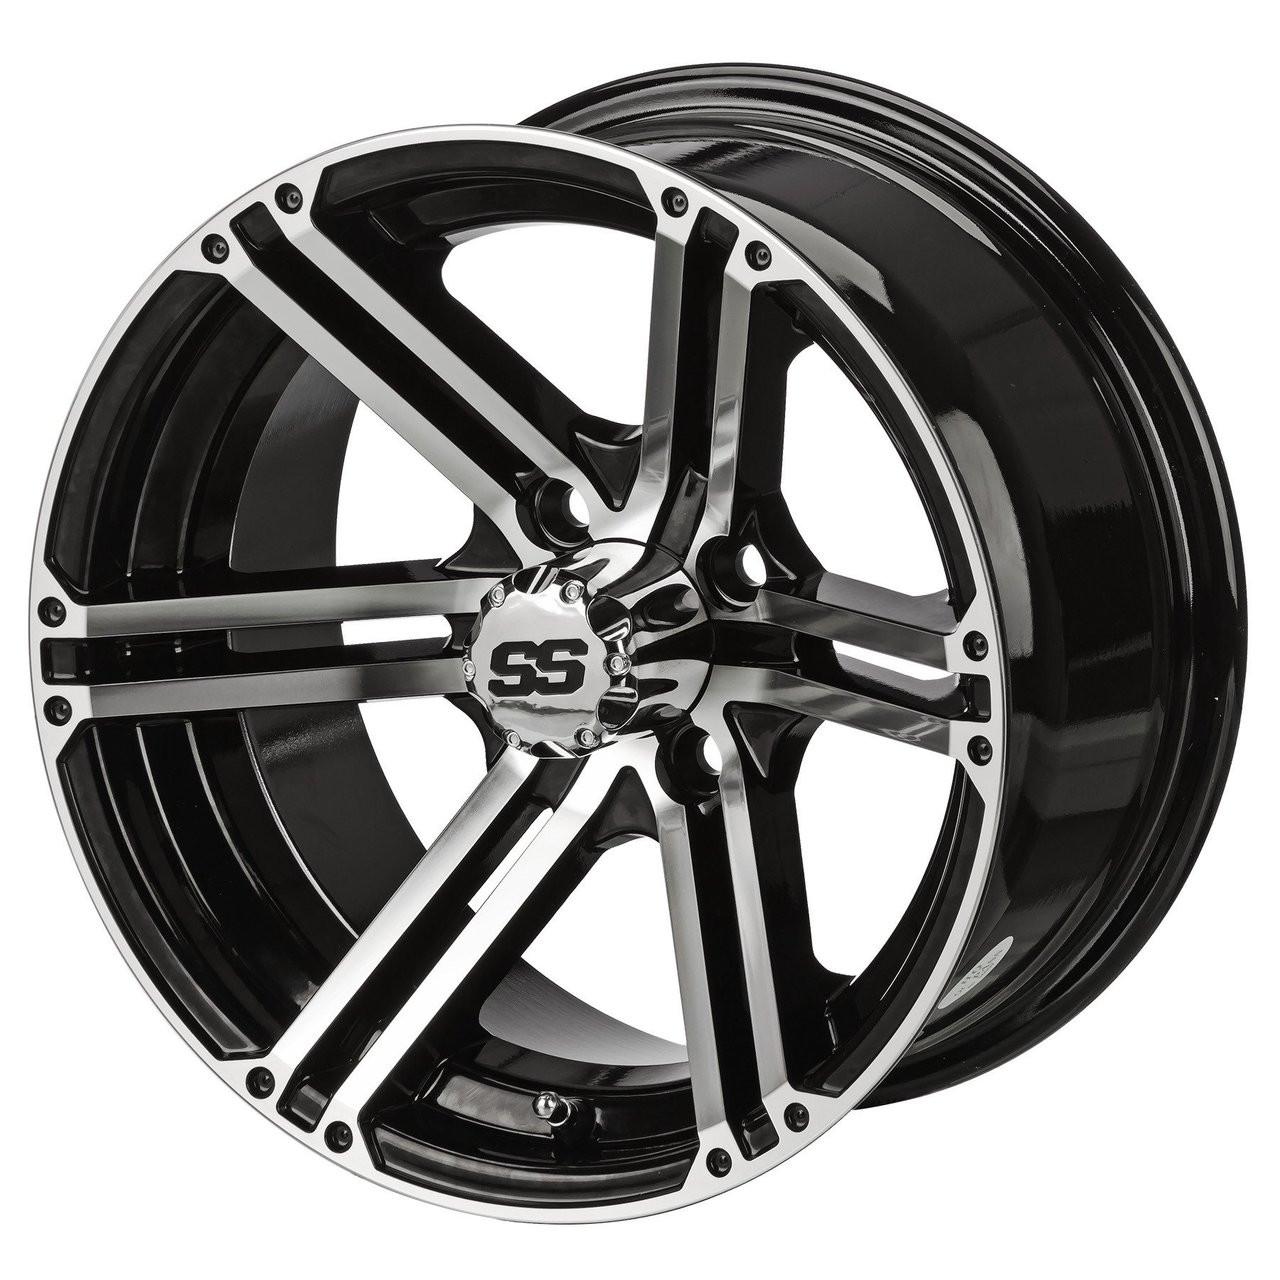 14 Terminator Machined Black Golf Cart Wheels Set Of 4 Golf Cart Tire Supply